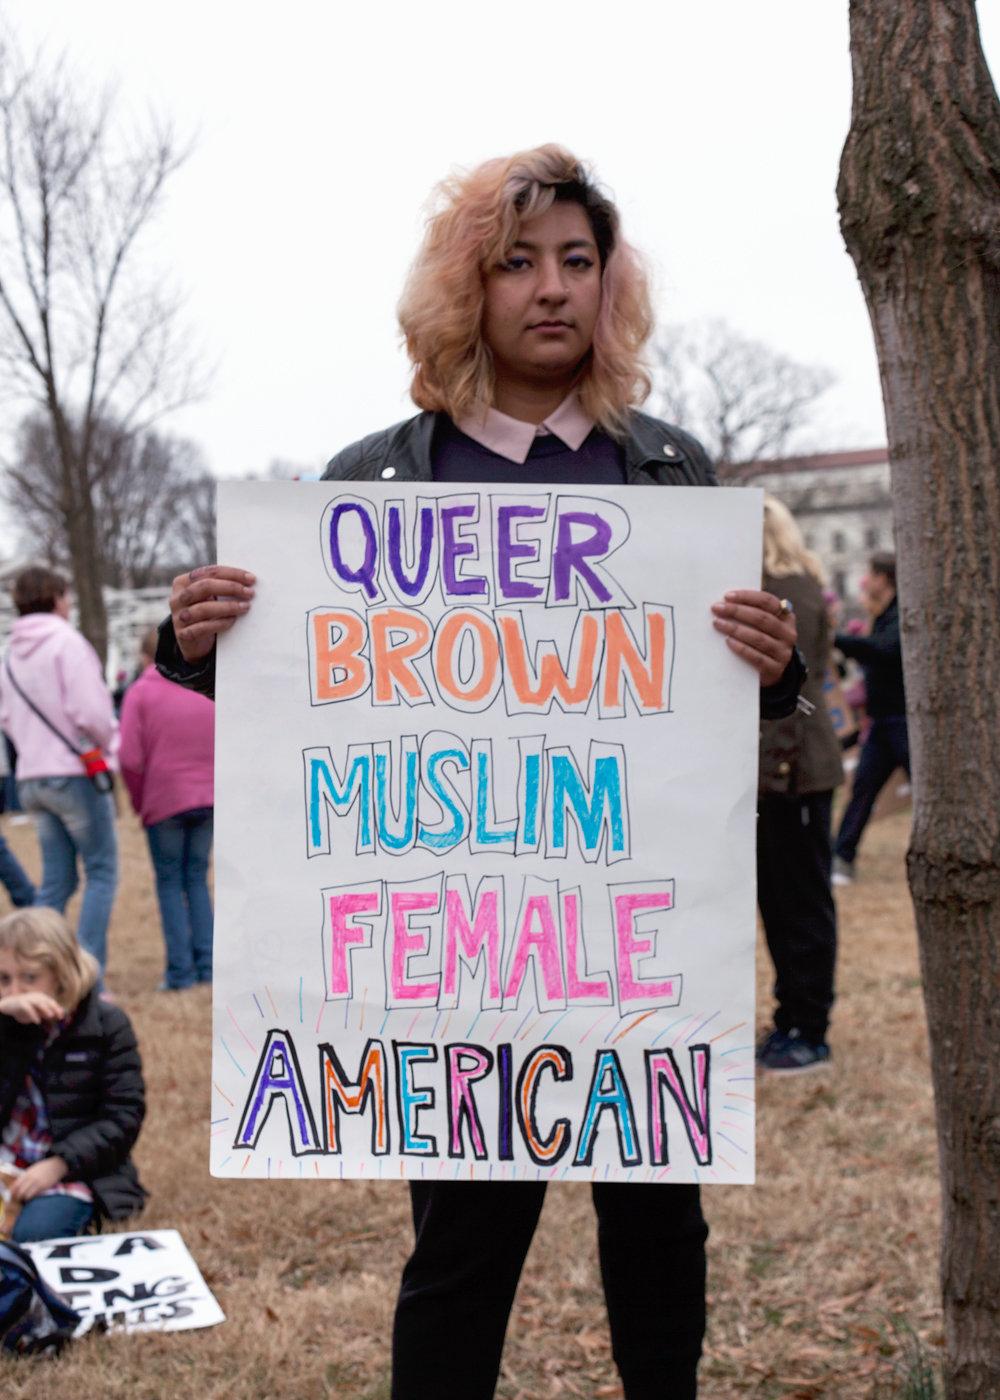 Women's March on Washington Zig Metzler - Queer Brown Muslim Female American